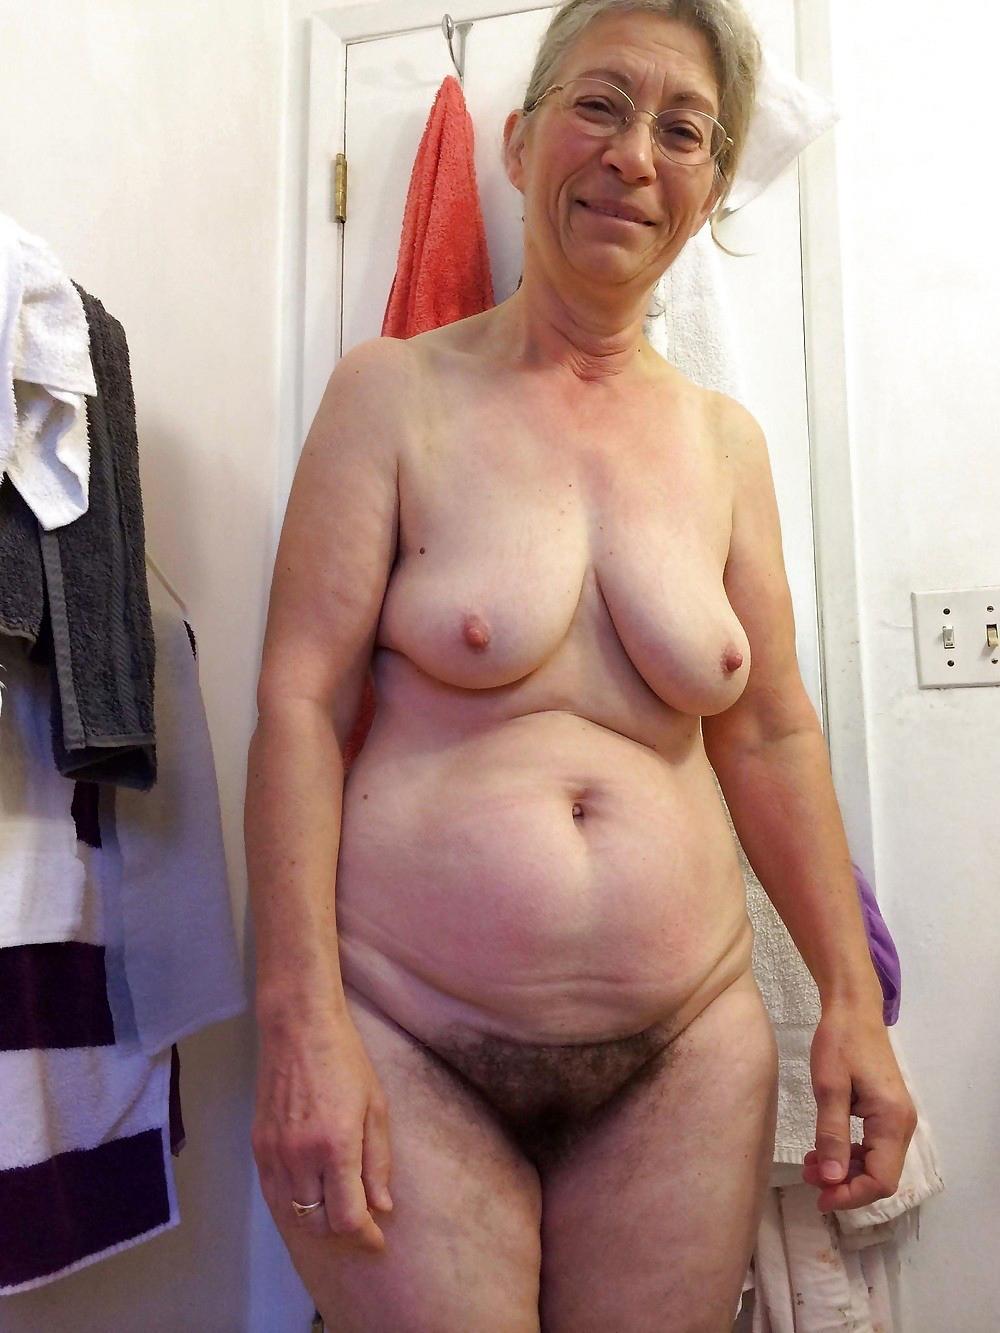 Porn galleries granny Nude Grannies,